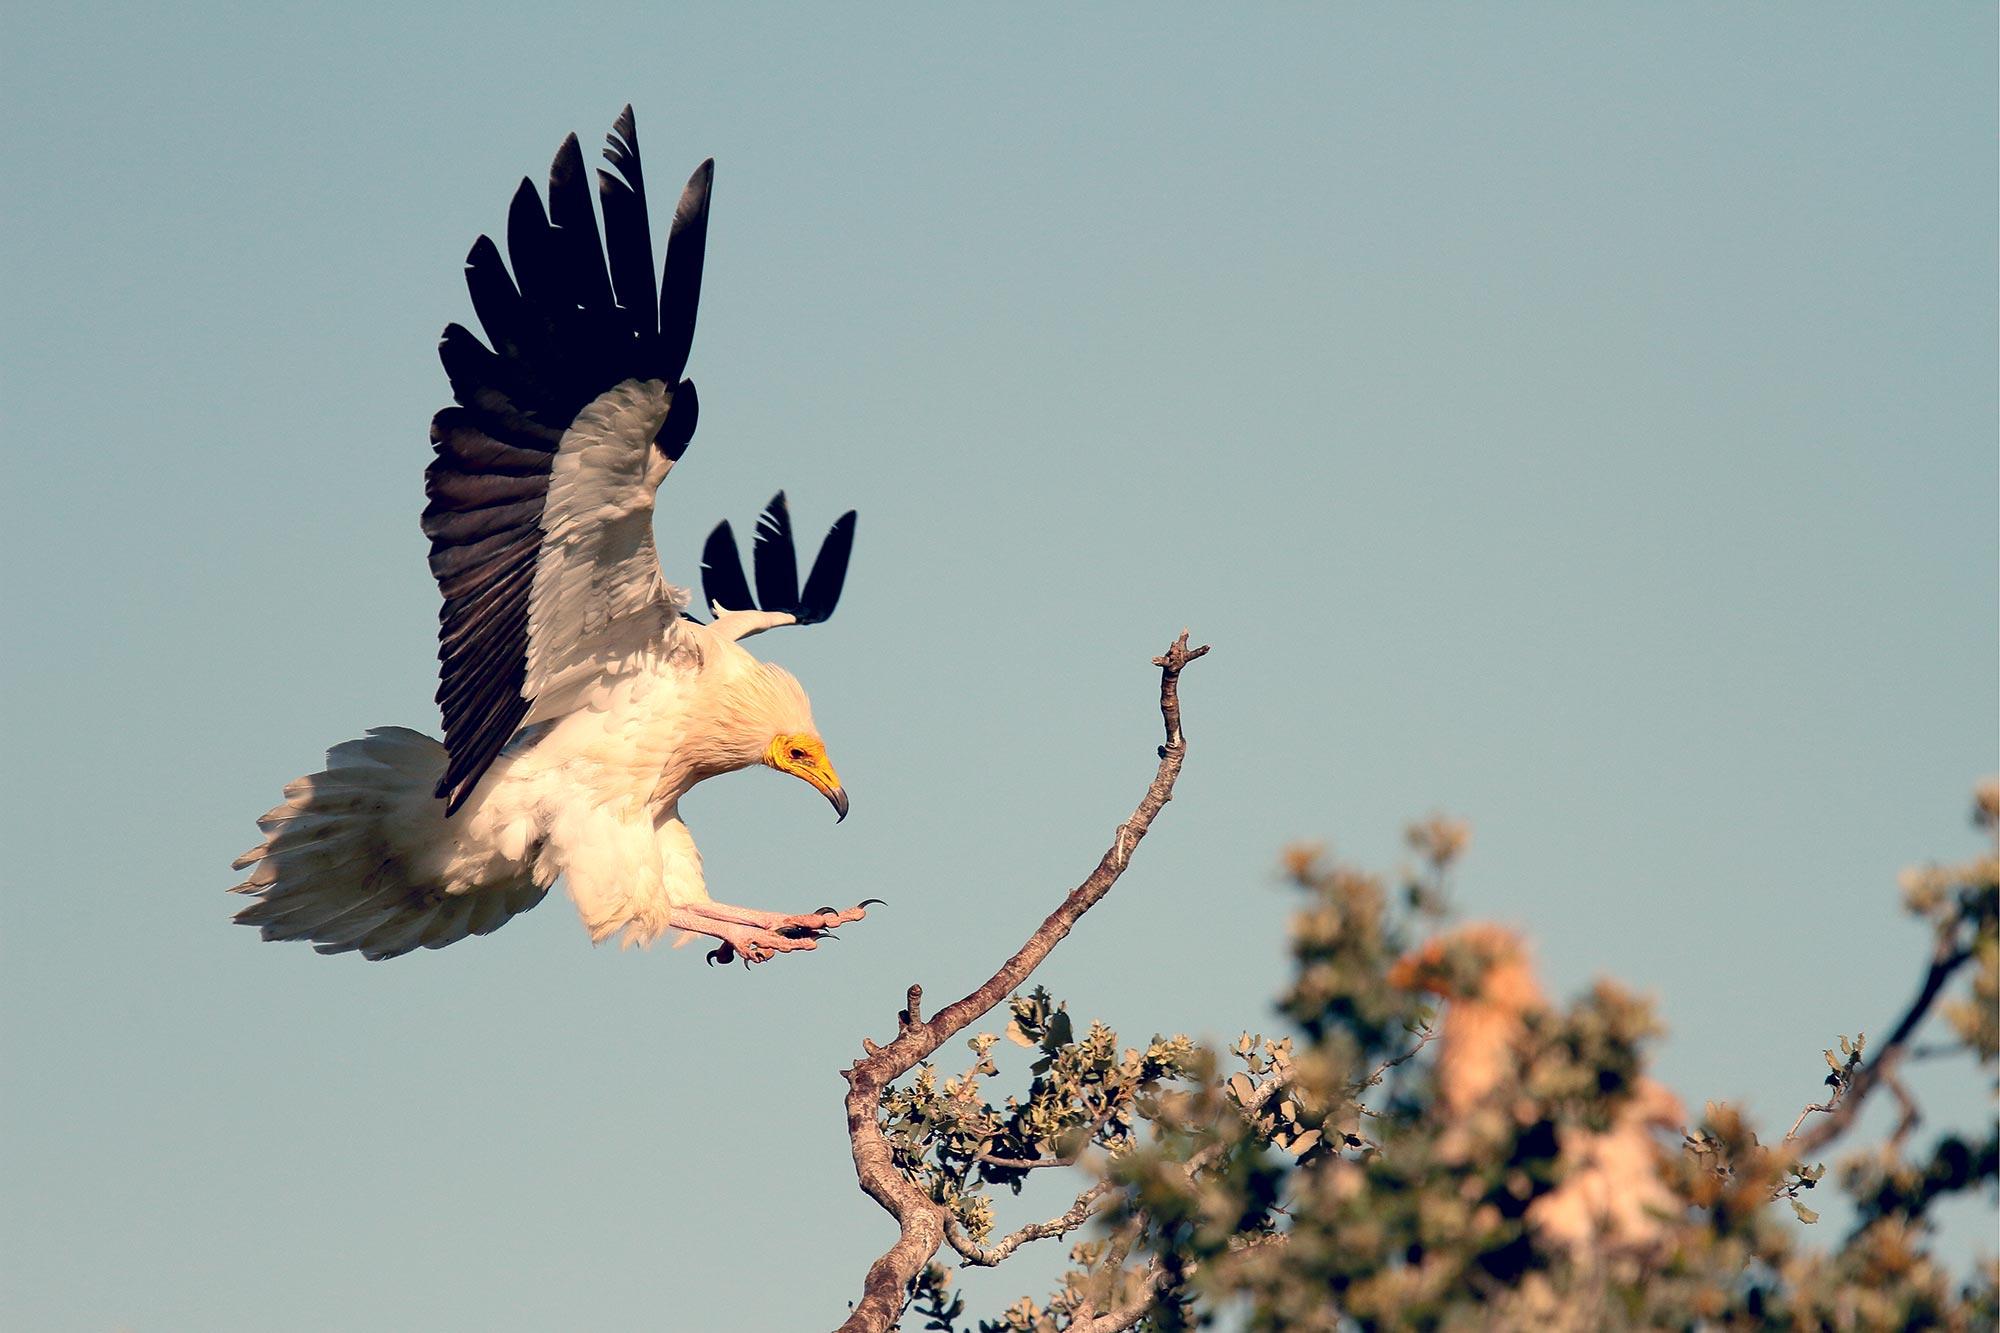 Fauna of Israel - Egyptian Vulture